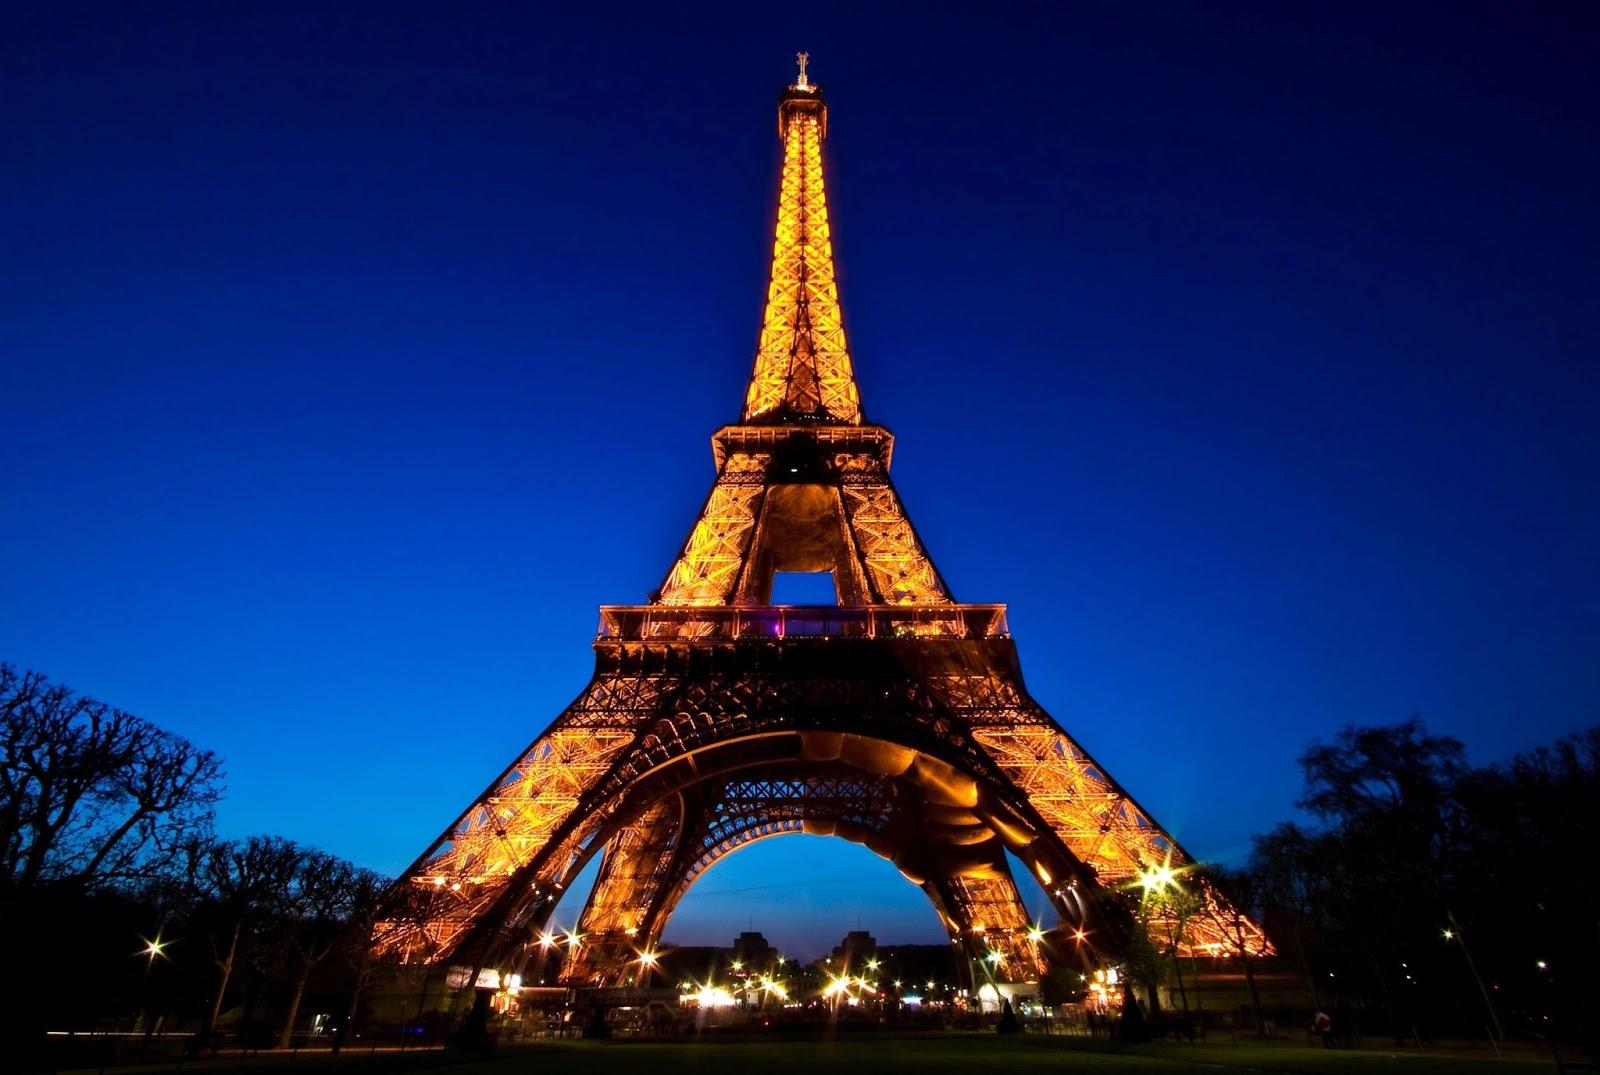 Eiffel-Tower-in-Paris-France.jpg